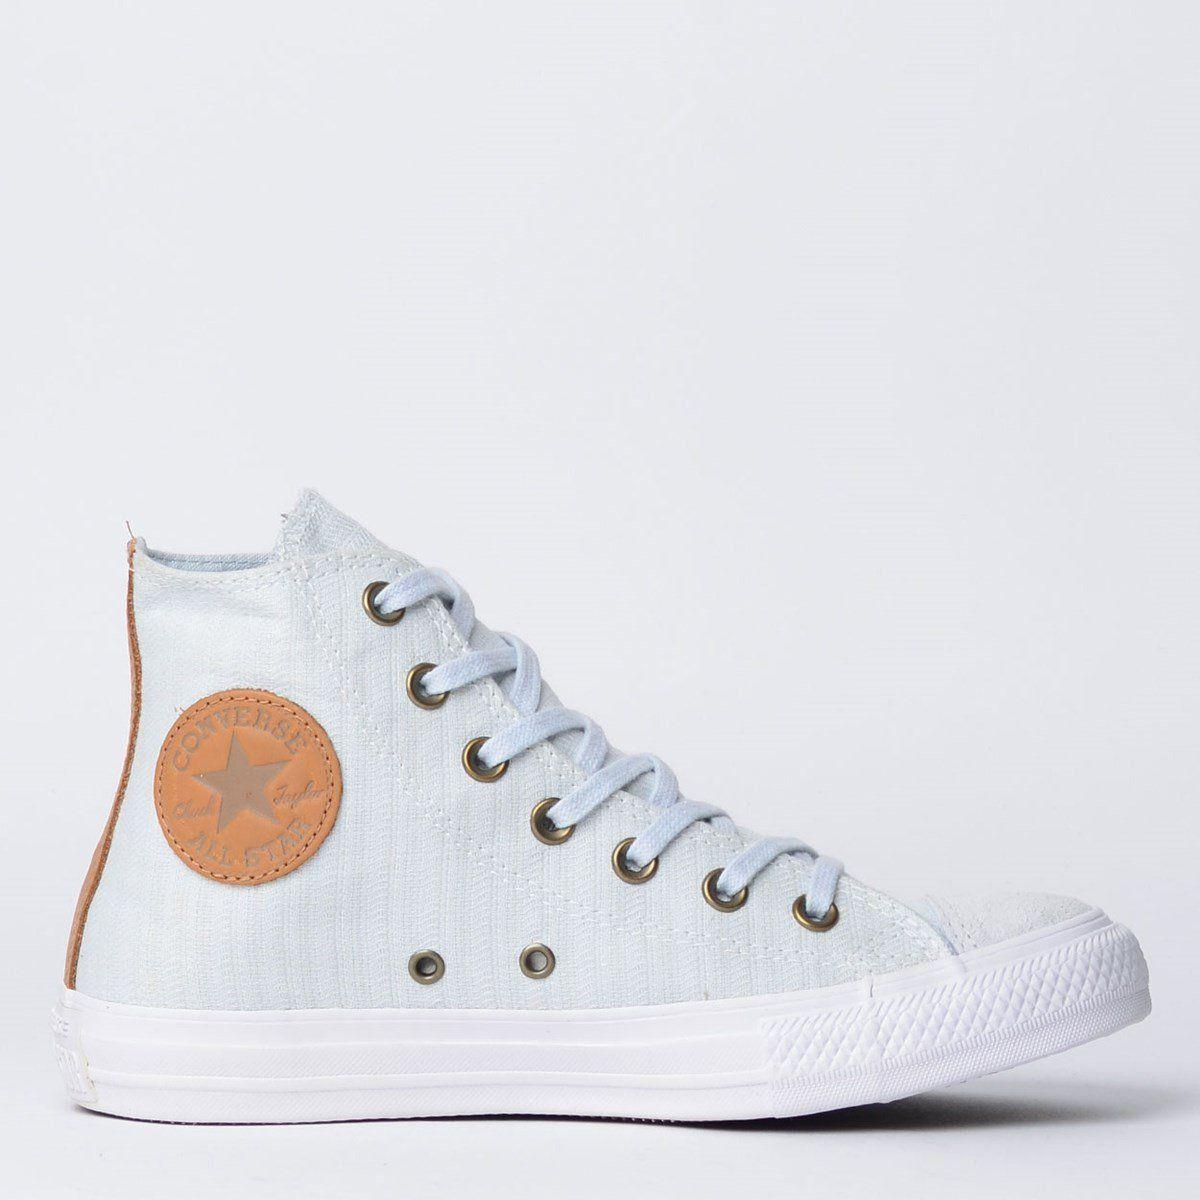 Tênis Converse Chuck Taylor All Star Hi Cinza Puro/Caramelo